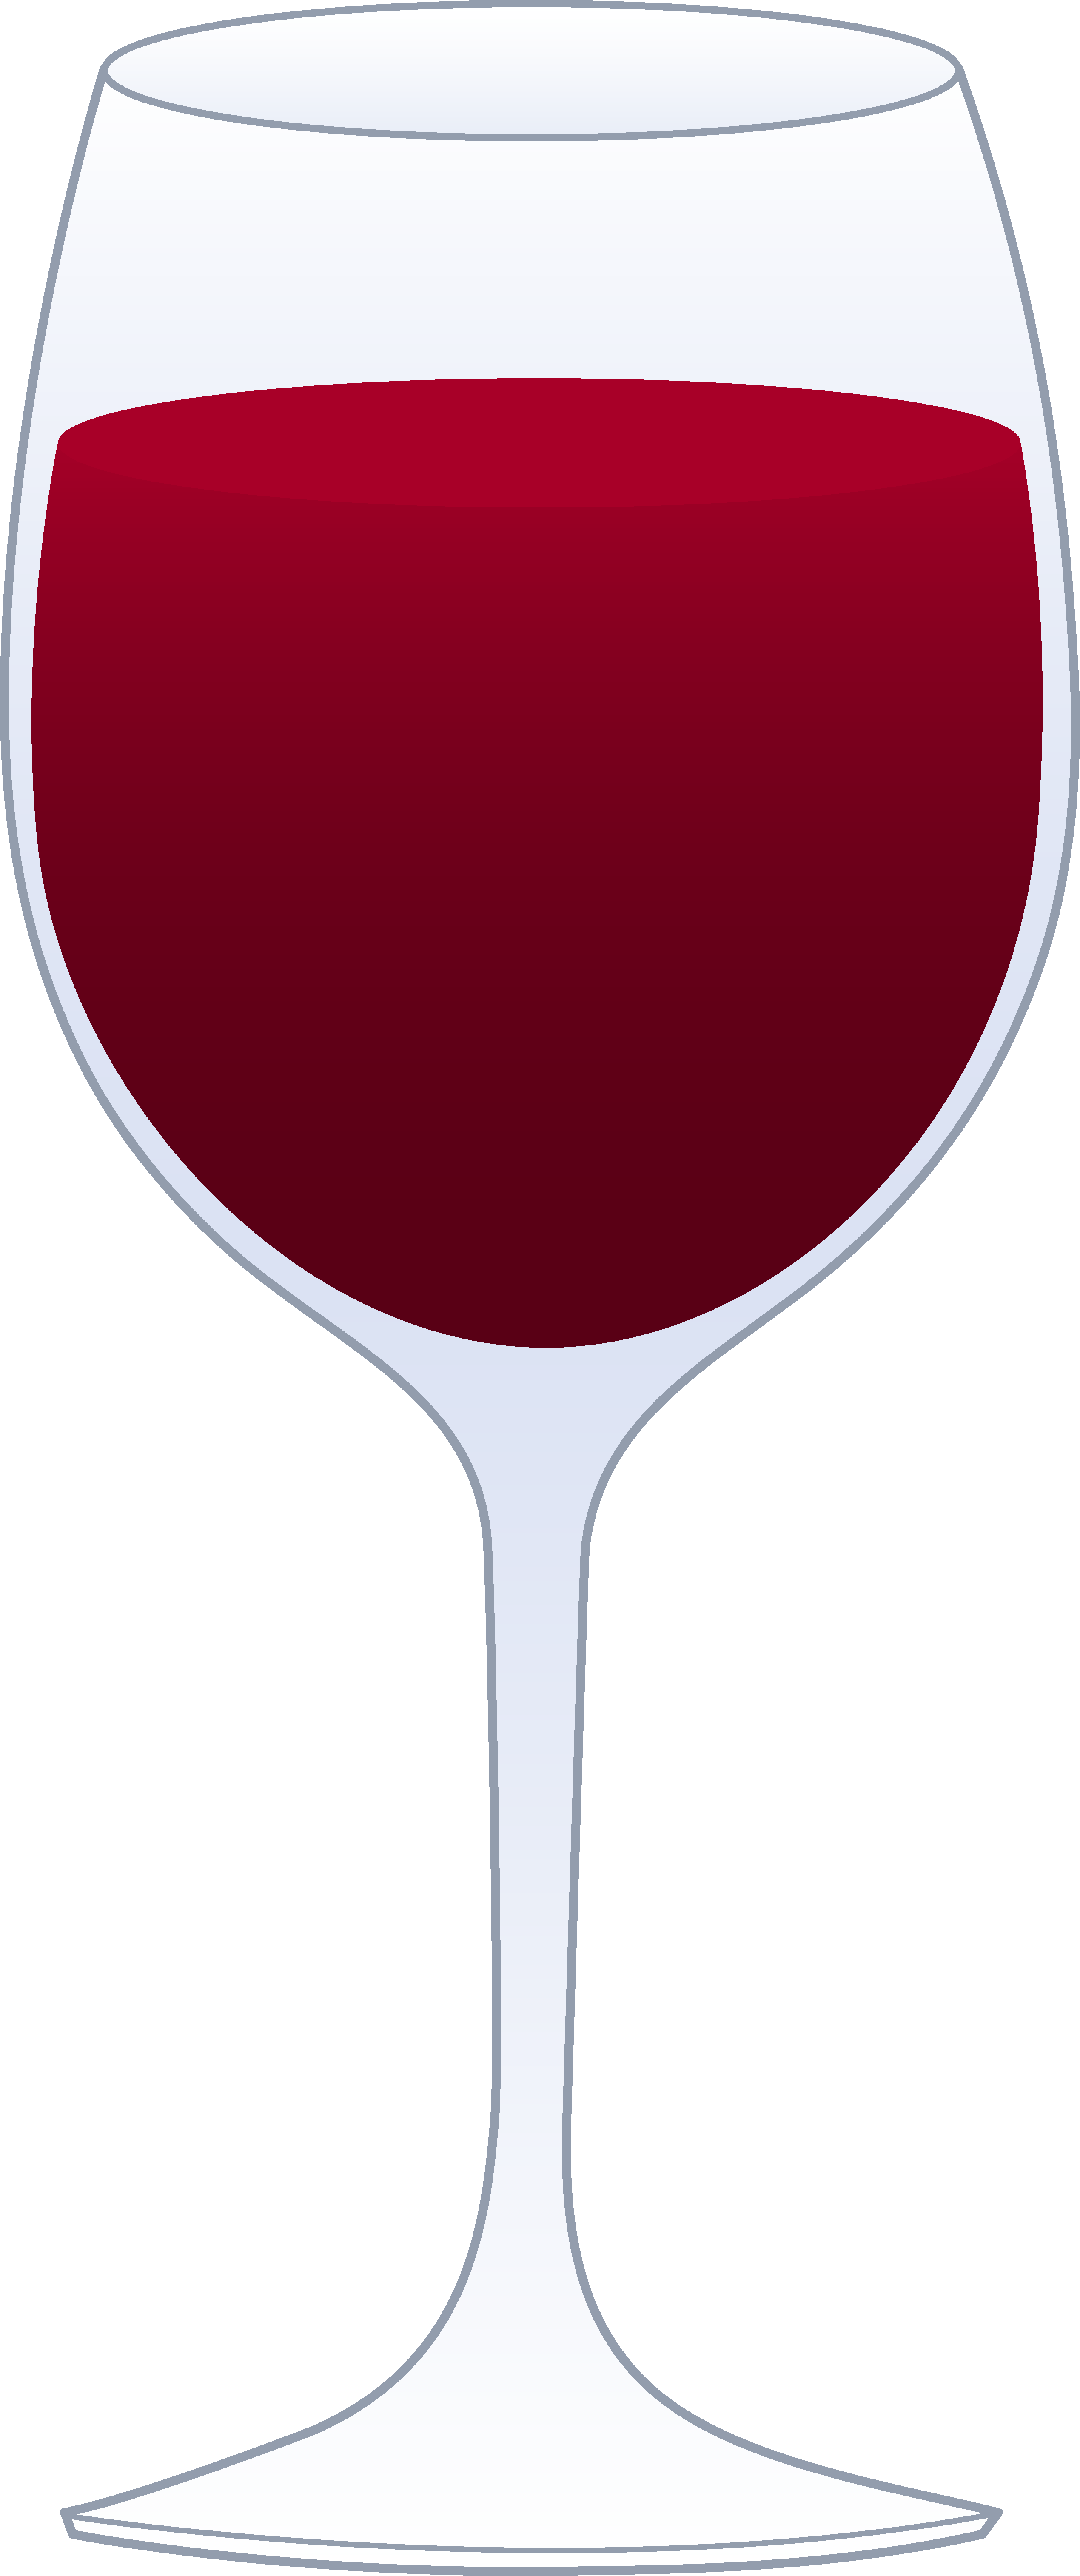 Free Wine Clip Art Image-Free Wine Clip Art Image-7